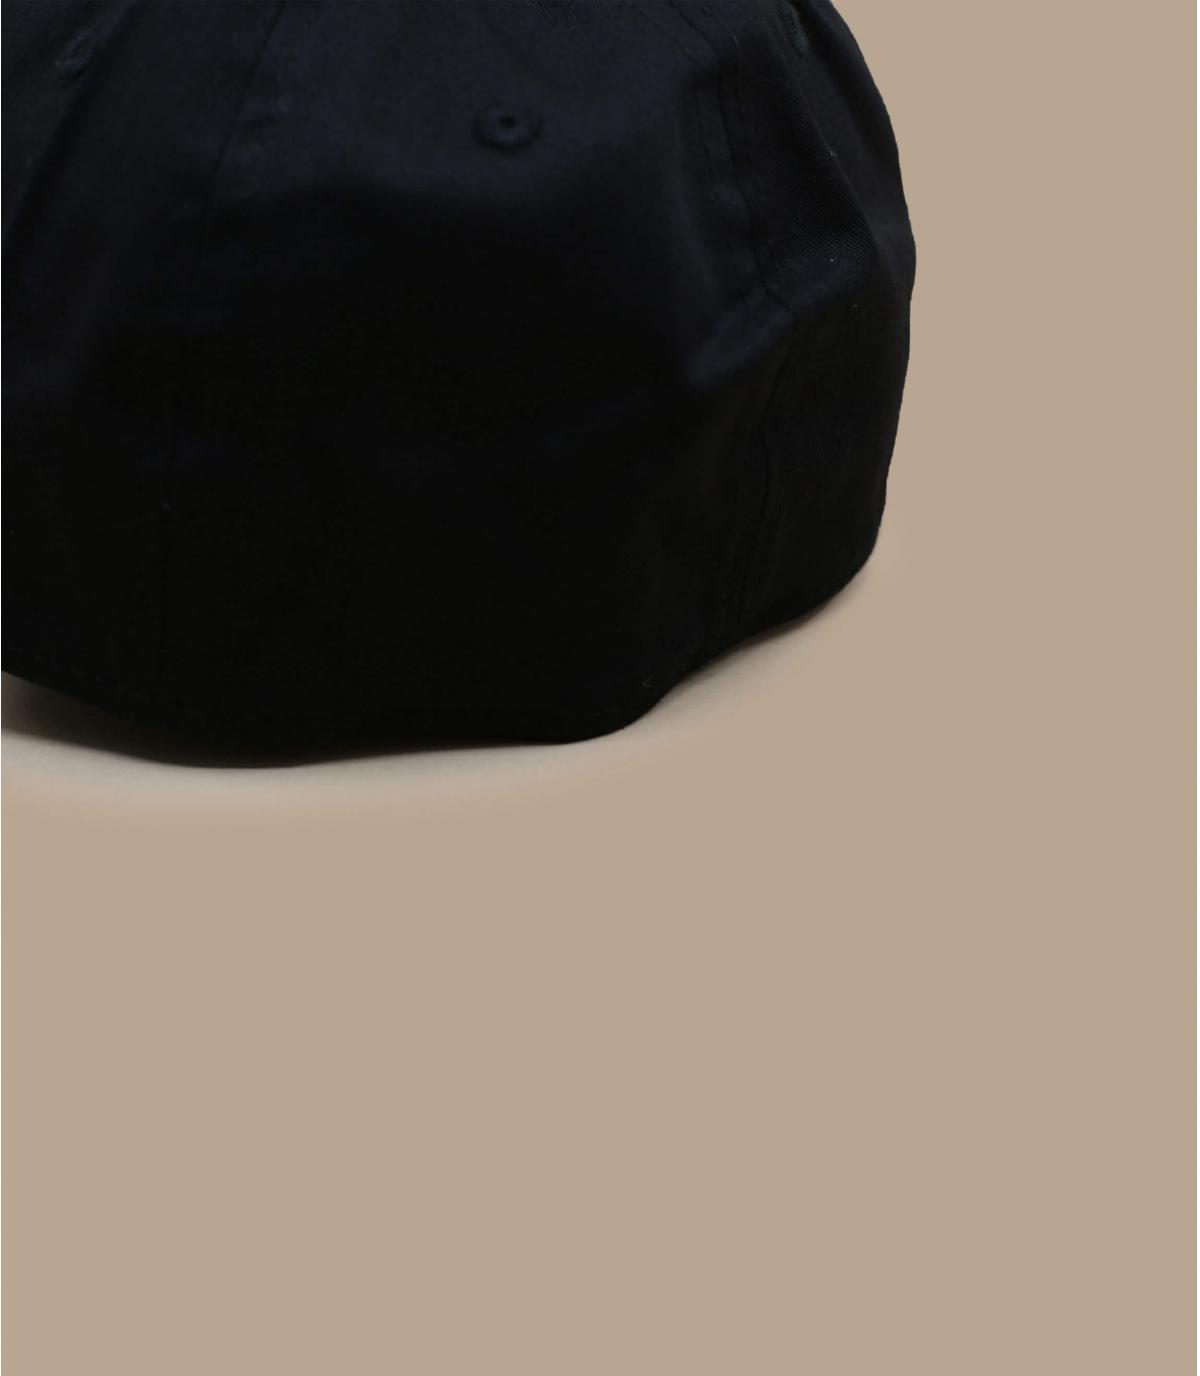 Détails 39thirty NY black black - image 4